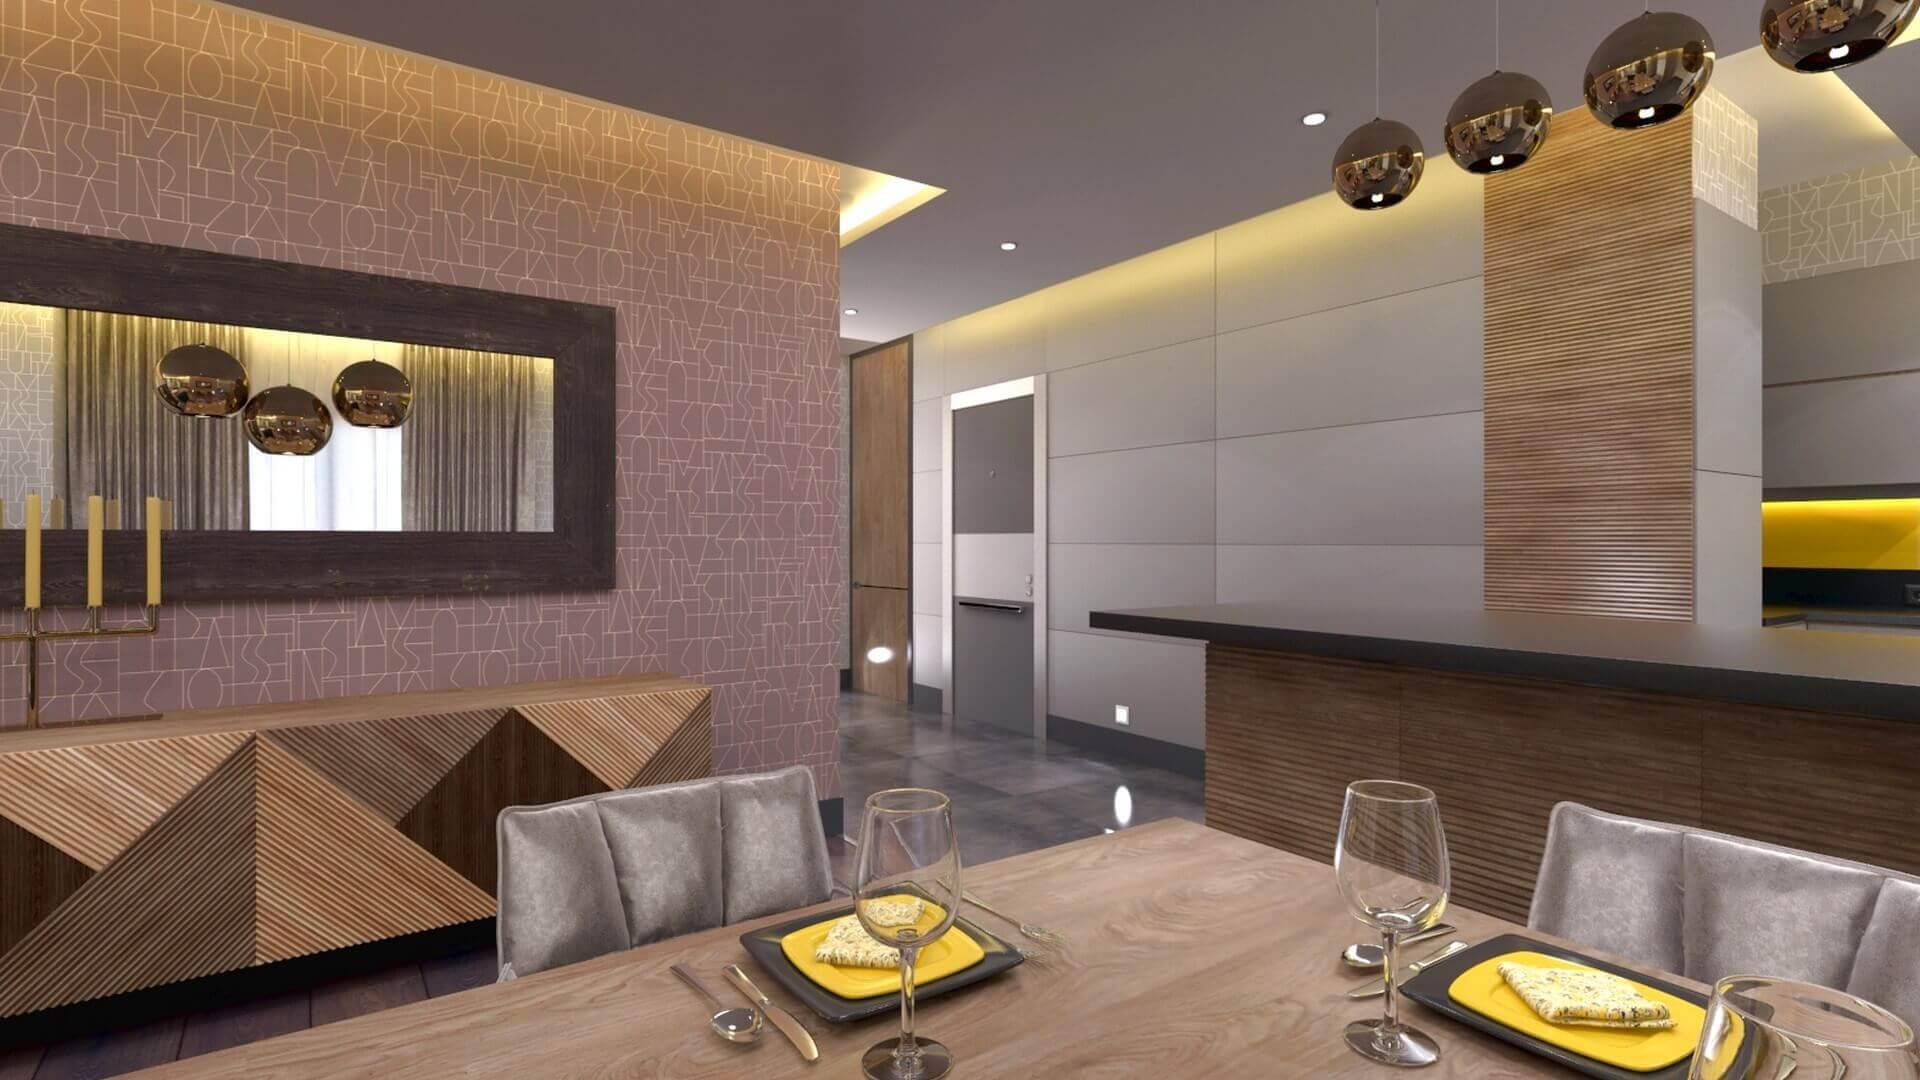 Villa interior design 3371 S. Dedeoglu Flat Residential